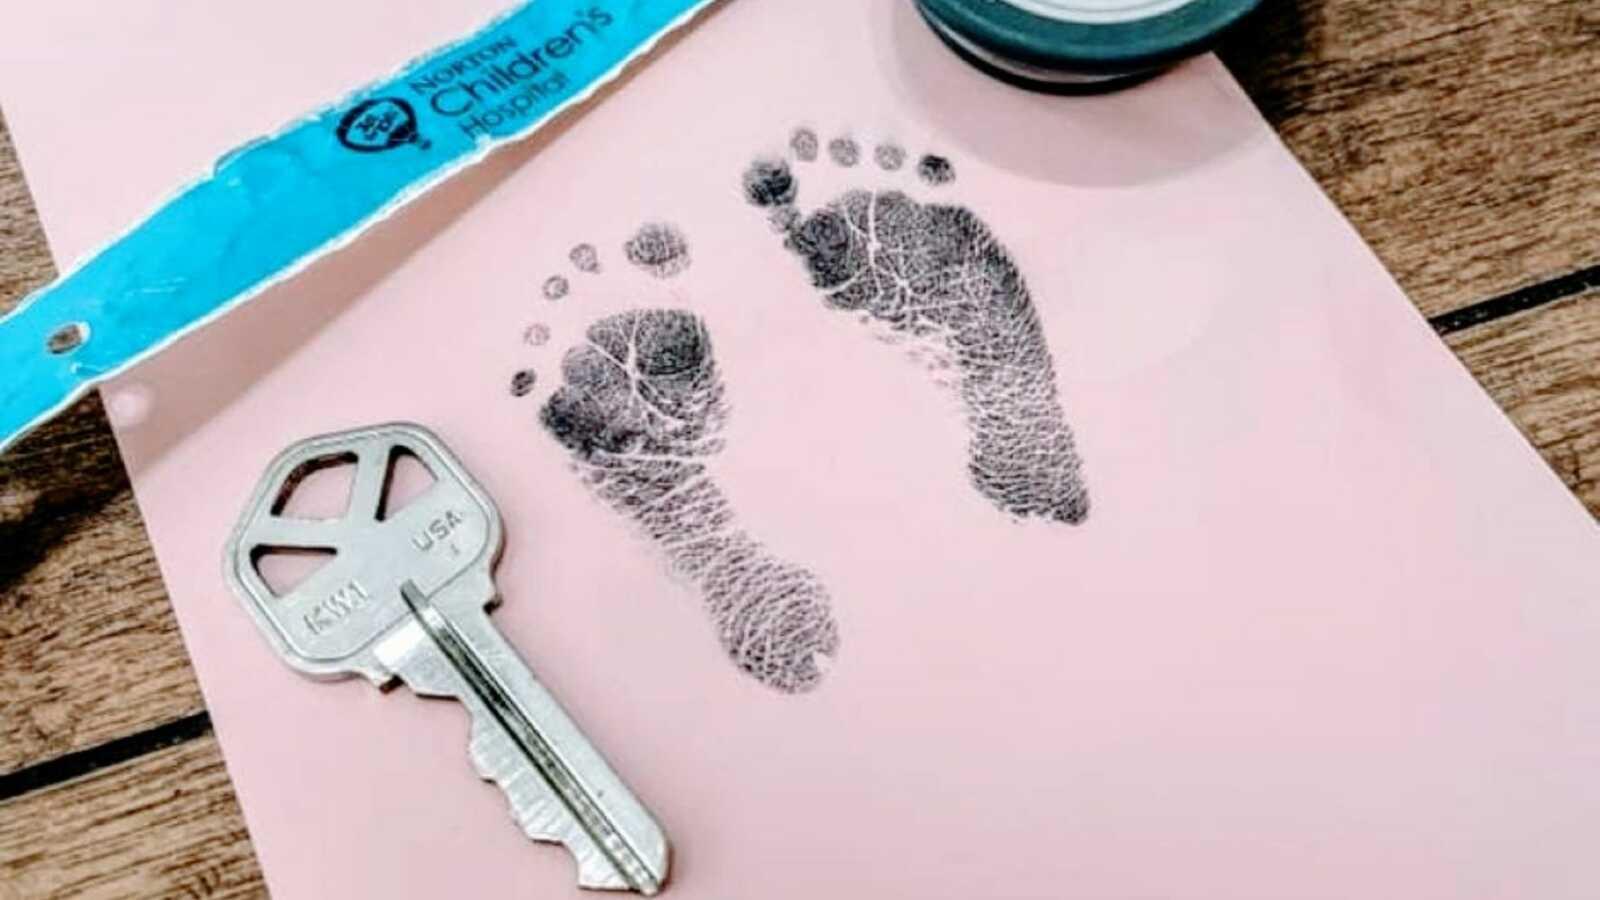 Nicu Mama在房子钥匙旁边拍了一张她的新生儿脚邮票